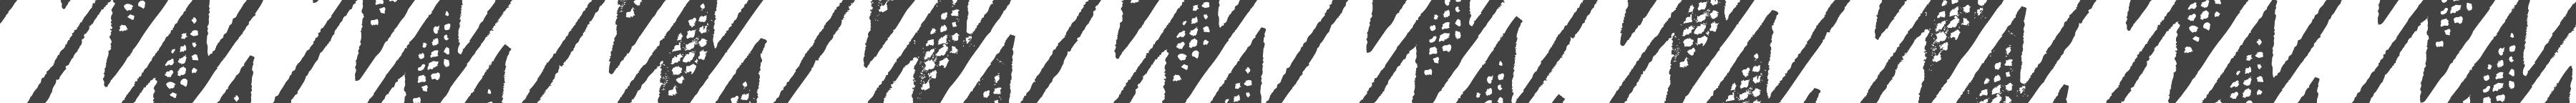 Uwila Skinny Banner